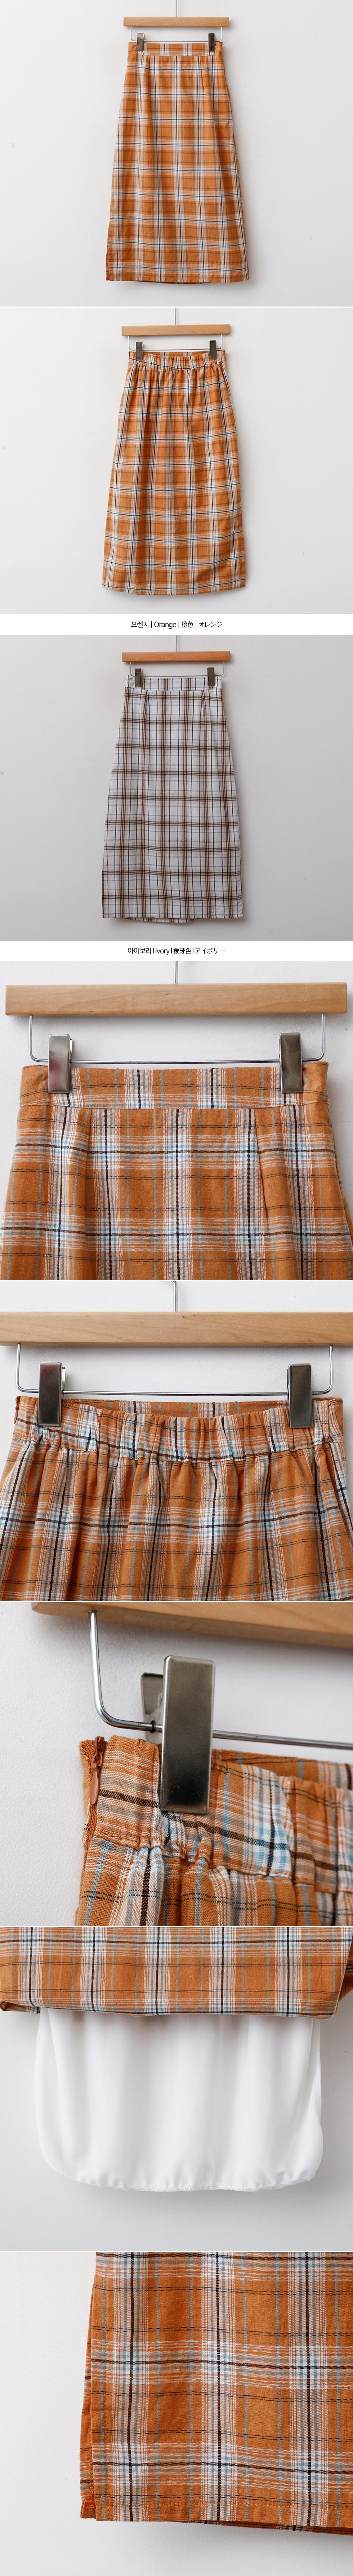 Sawing check skirt